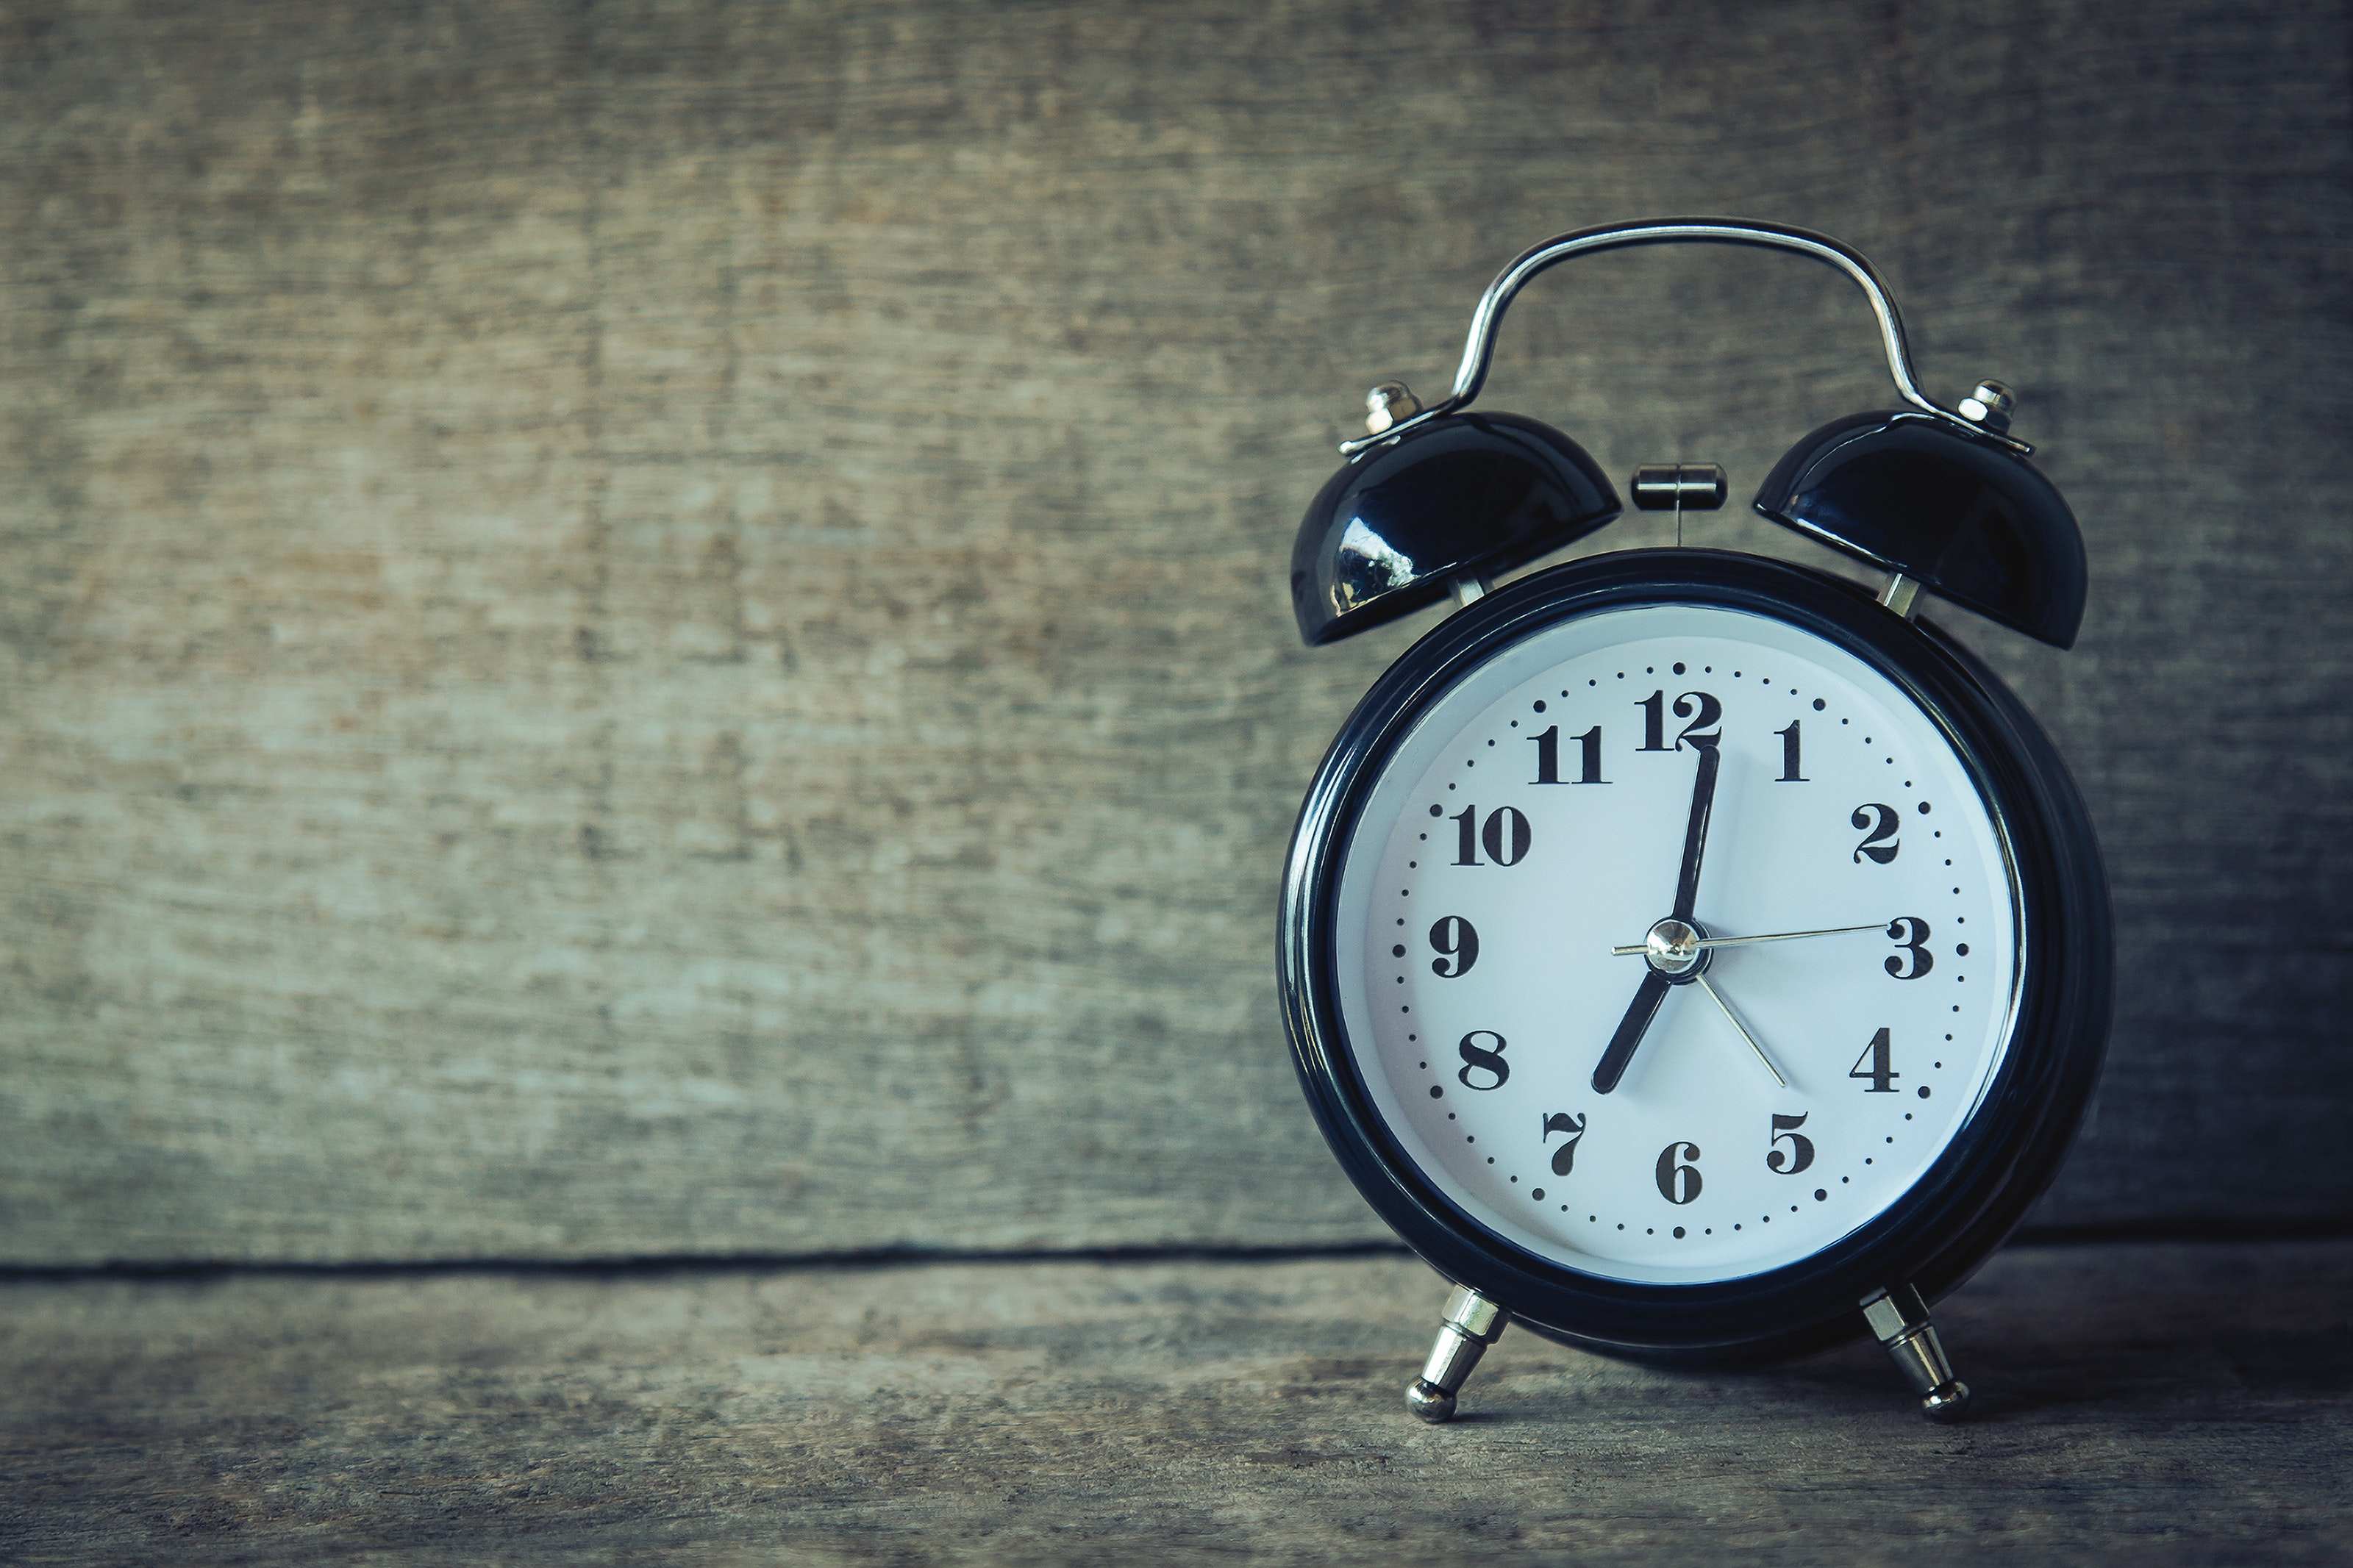 Photograph of a small alarm clock